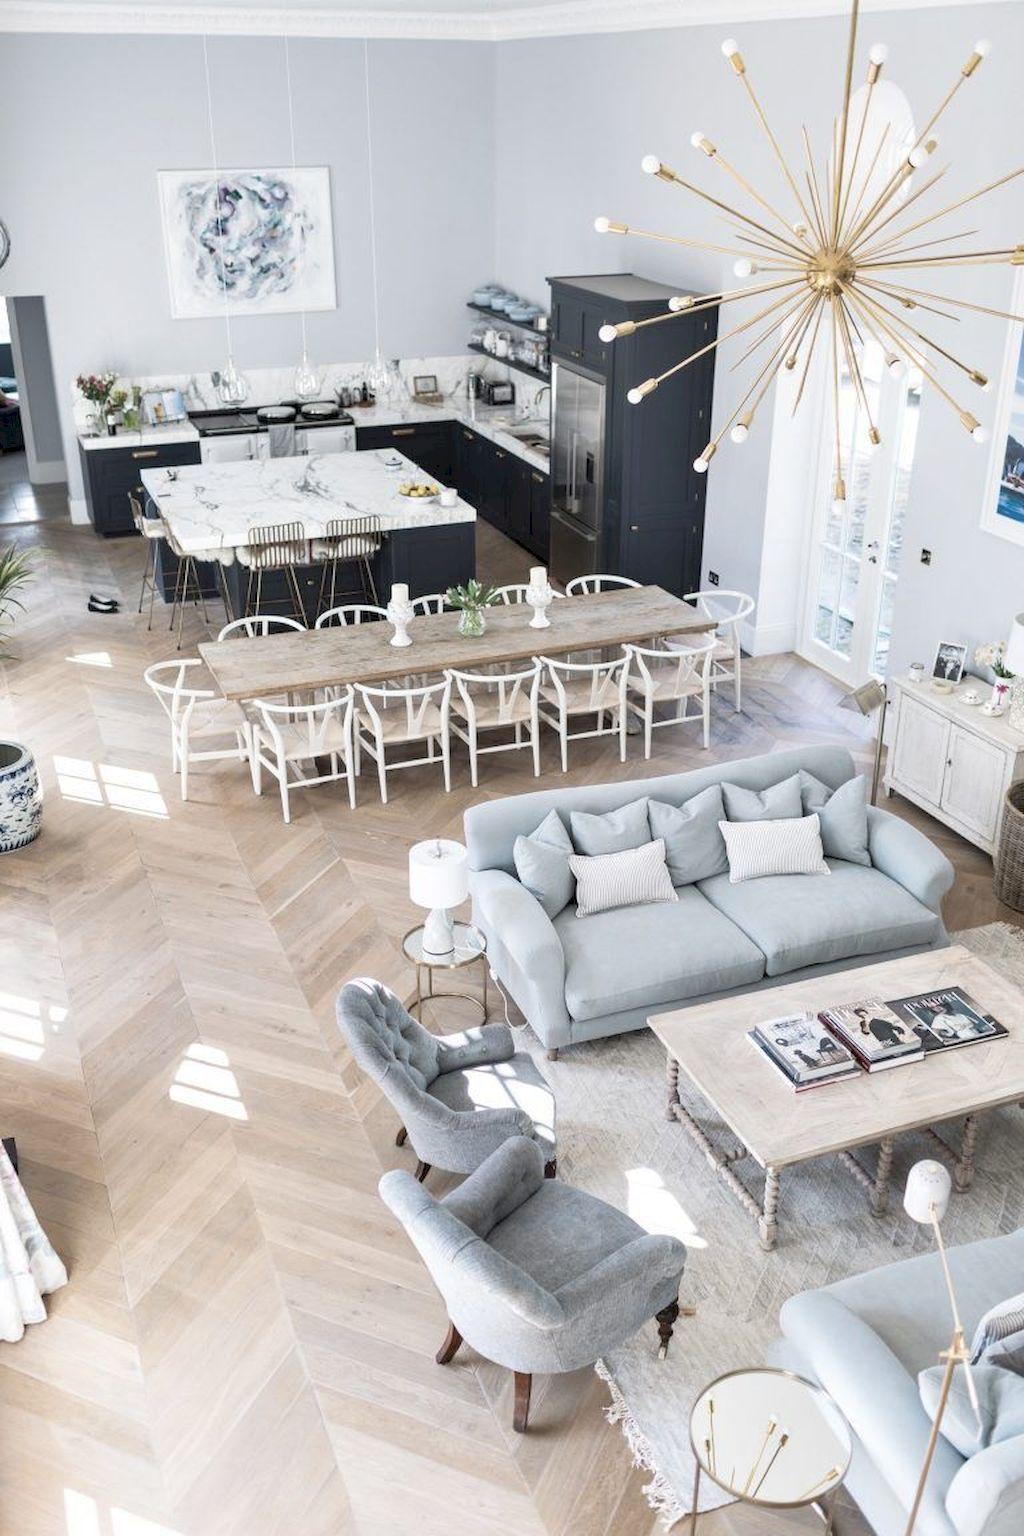 Unhealthy Home Furniture Layout #homesweethome #FurnitureLivingRoomChairs#furniture #furniturelivingroomchairs #home #homesweethome #layout #unhealthy